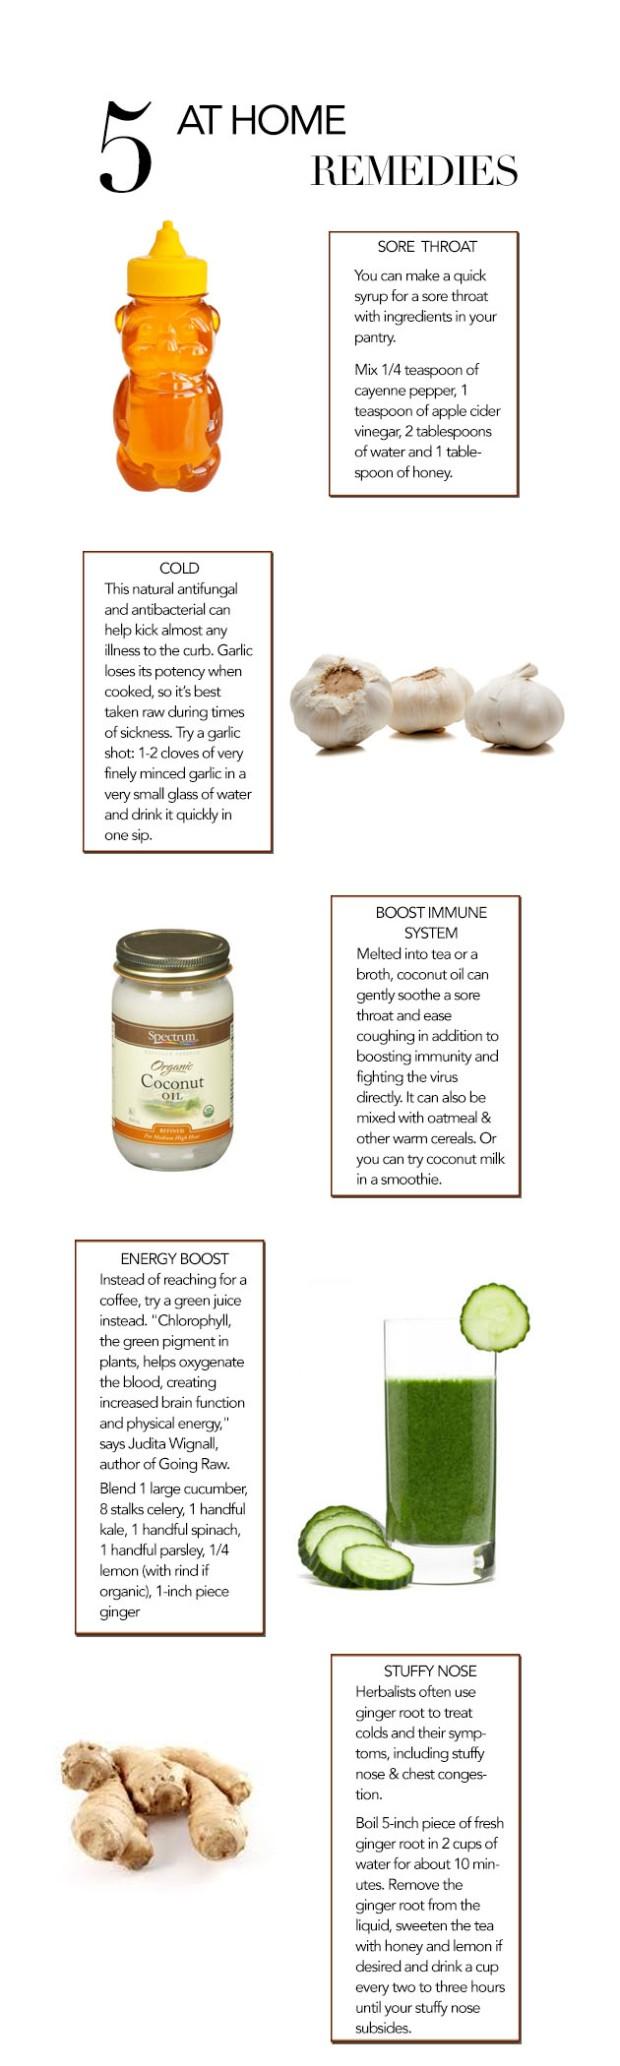 Cold Remedies Natural News